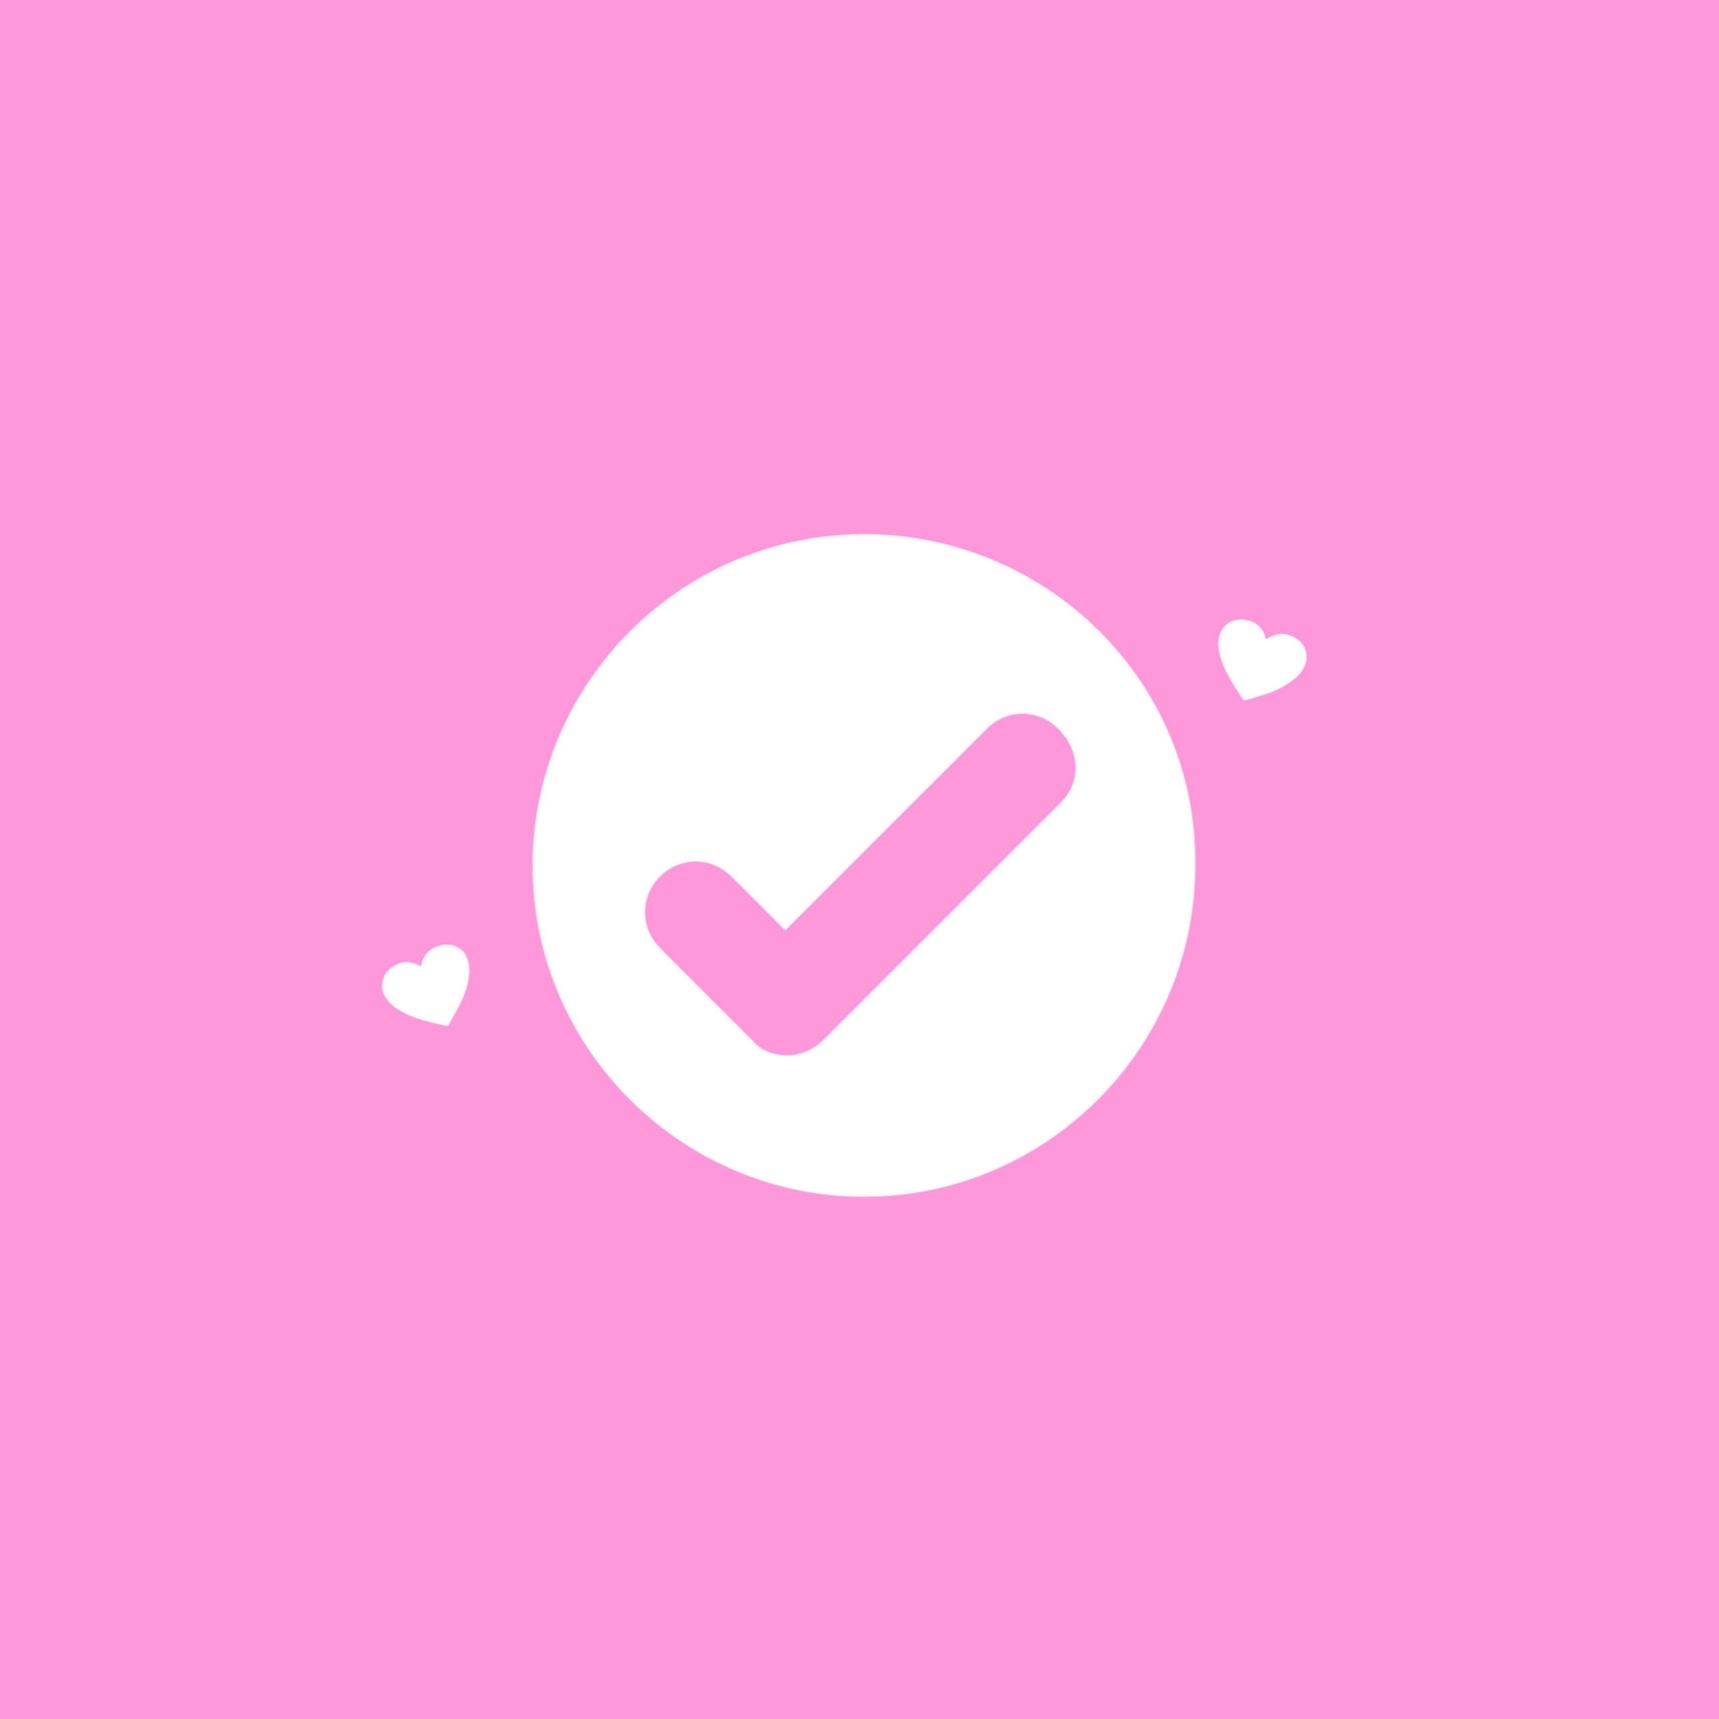 Love tasks - Endorse skills through task coordination and completion.